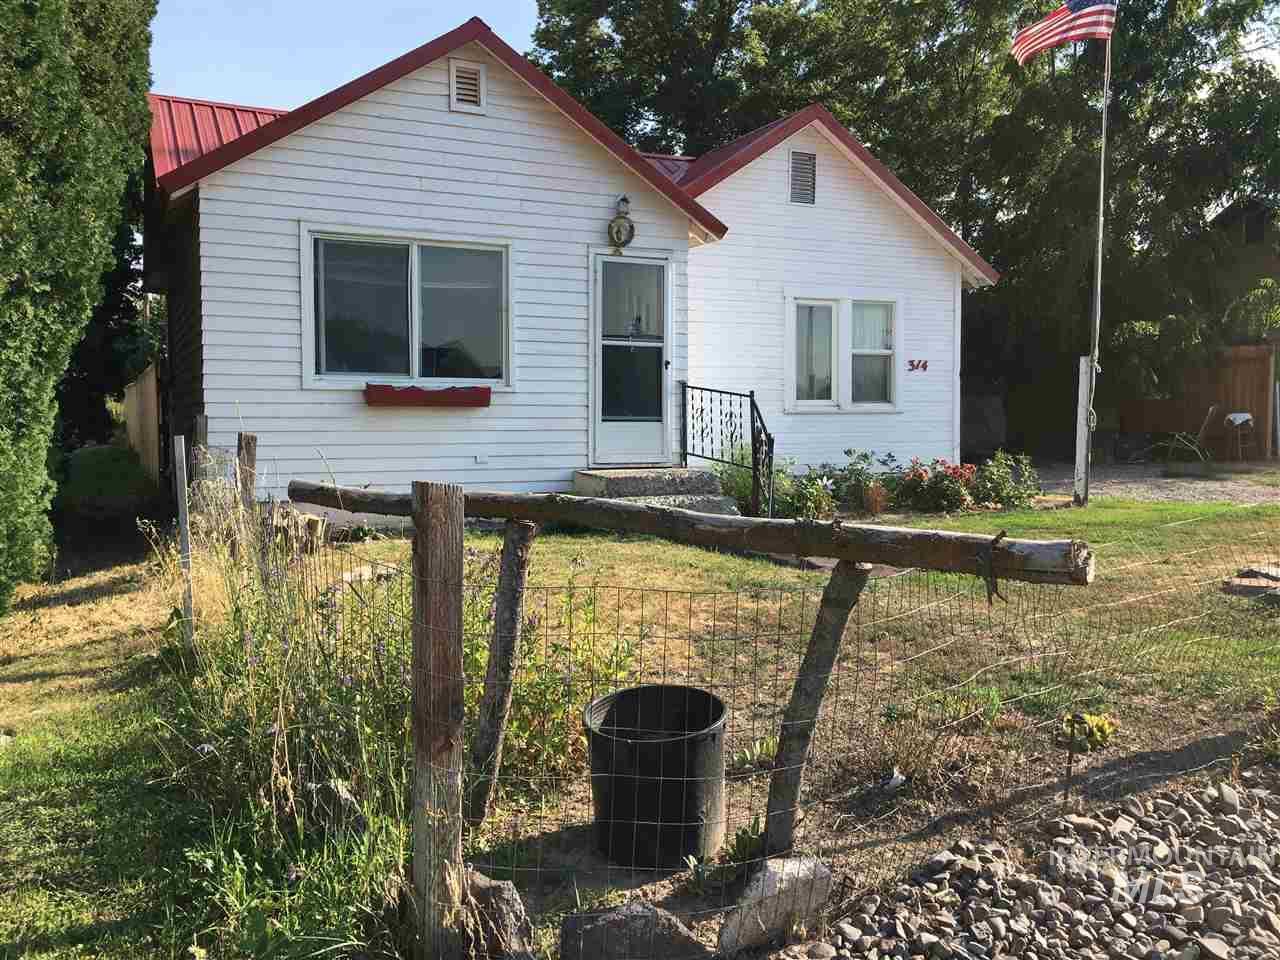 Single Family Home for Sale at 314 2nd Street 314 2nd Street Hazelton, Idaho 83335